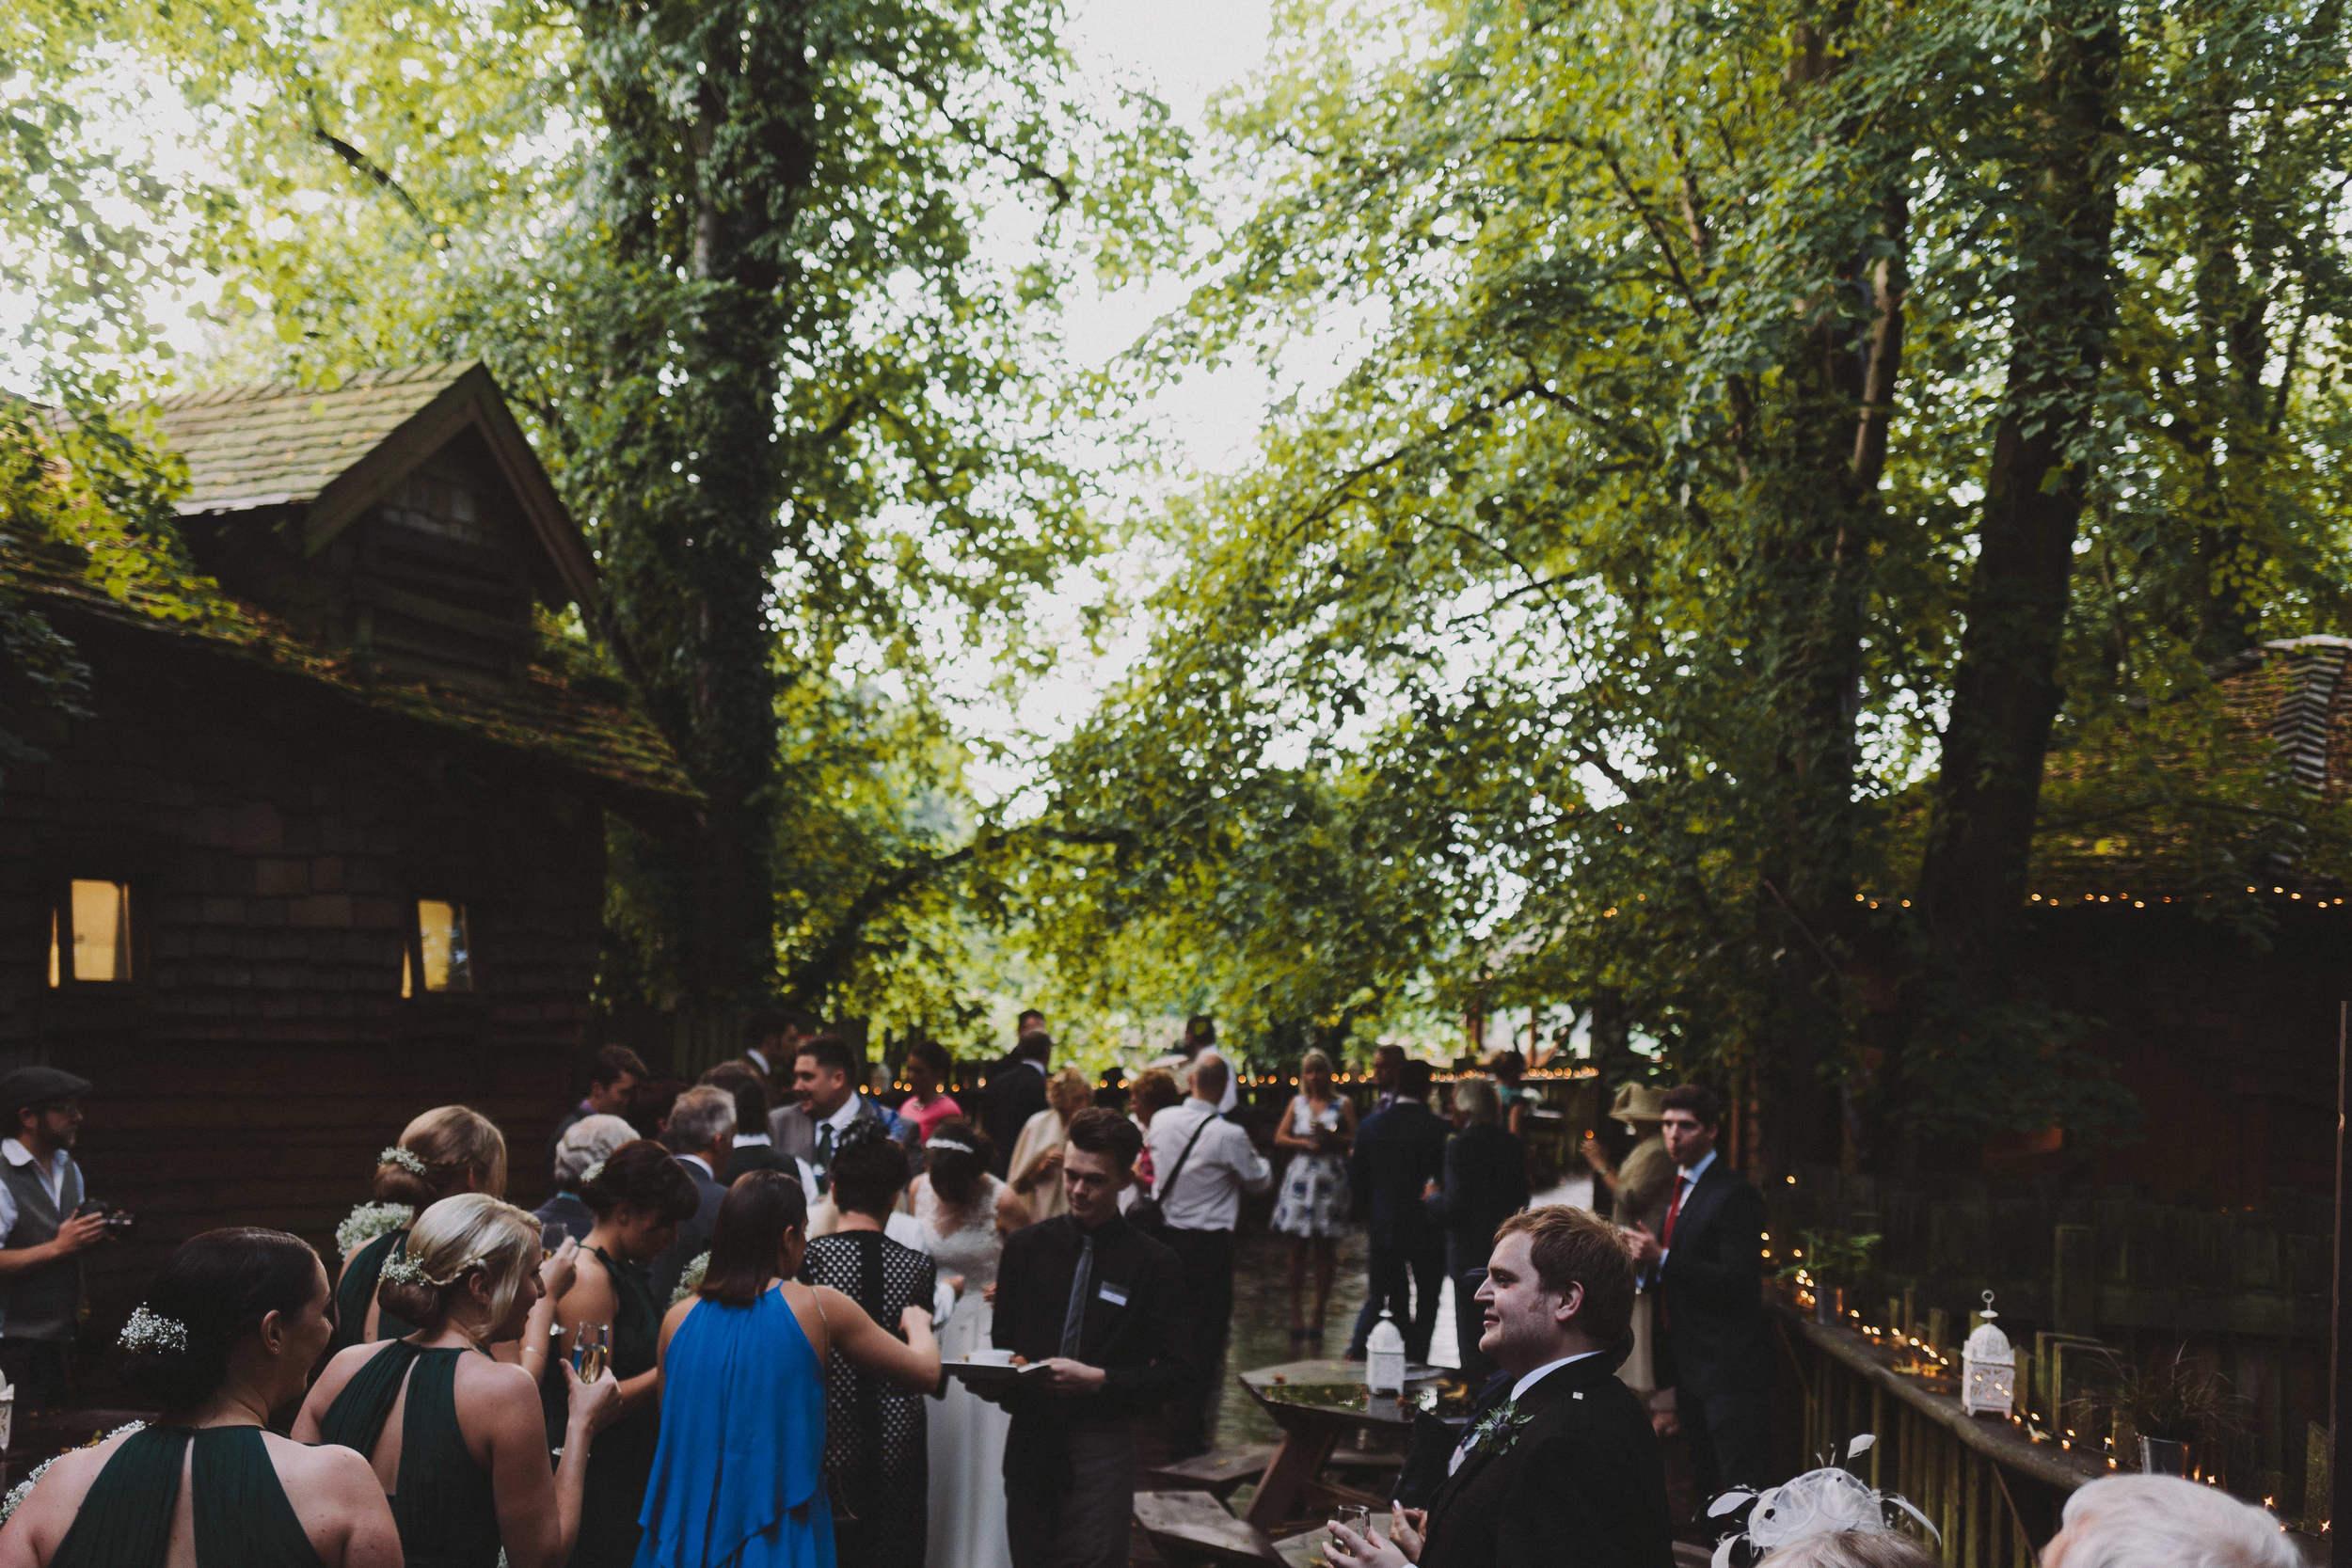 Alnwick Garden Treehouse Walkways